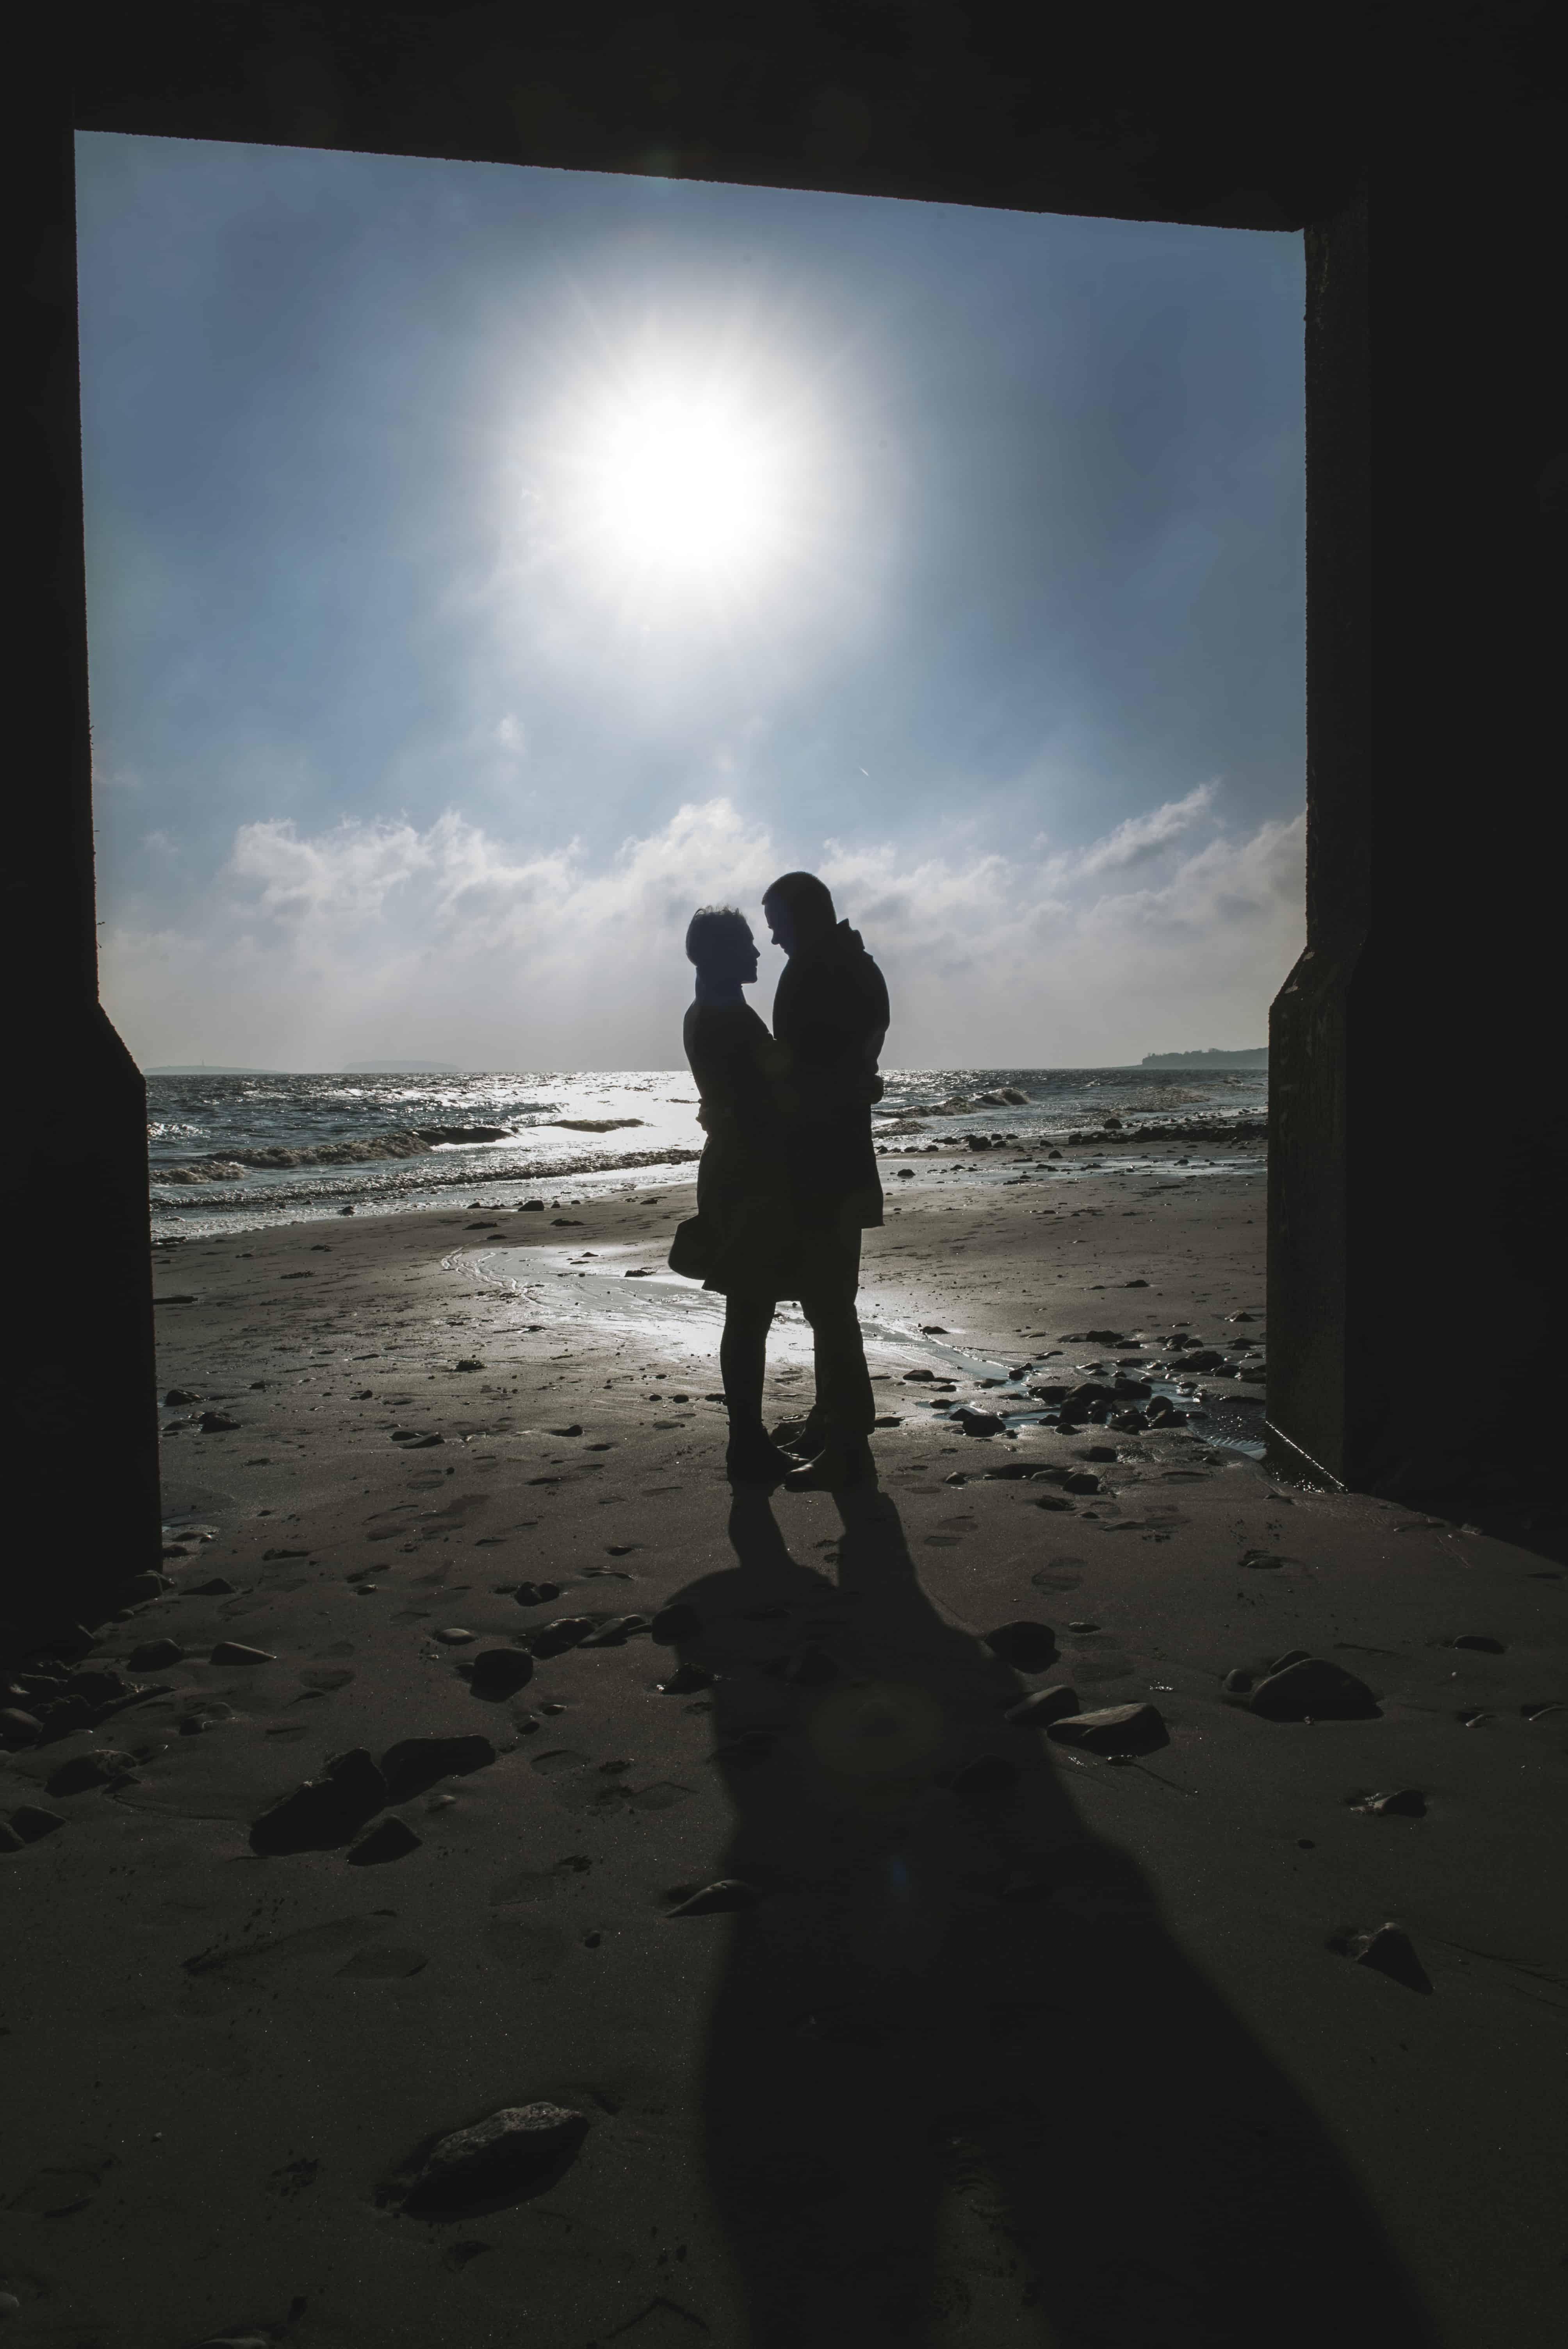 silhouette of couple stood on beach